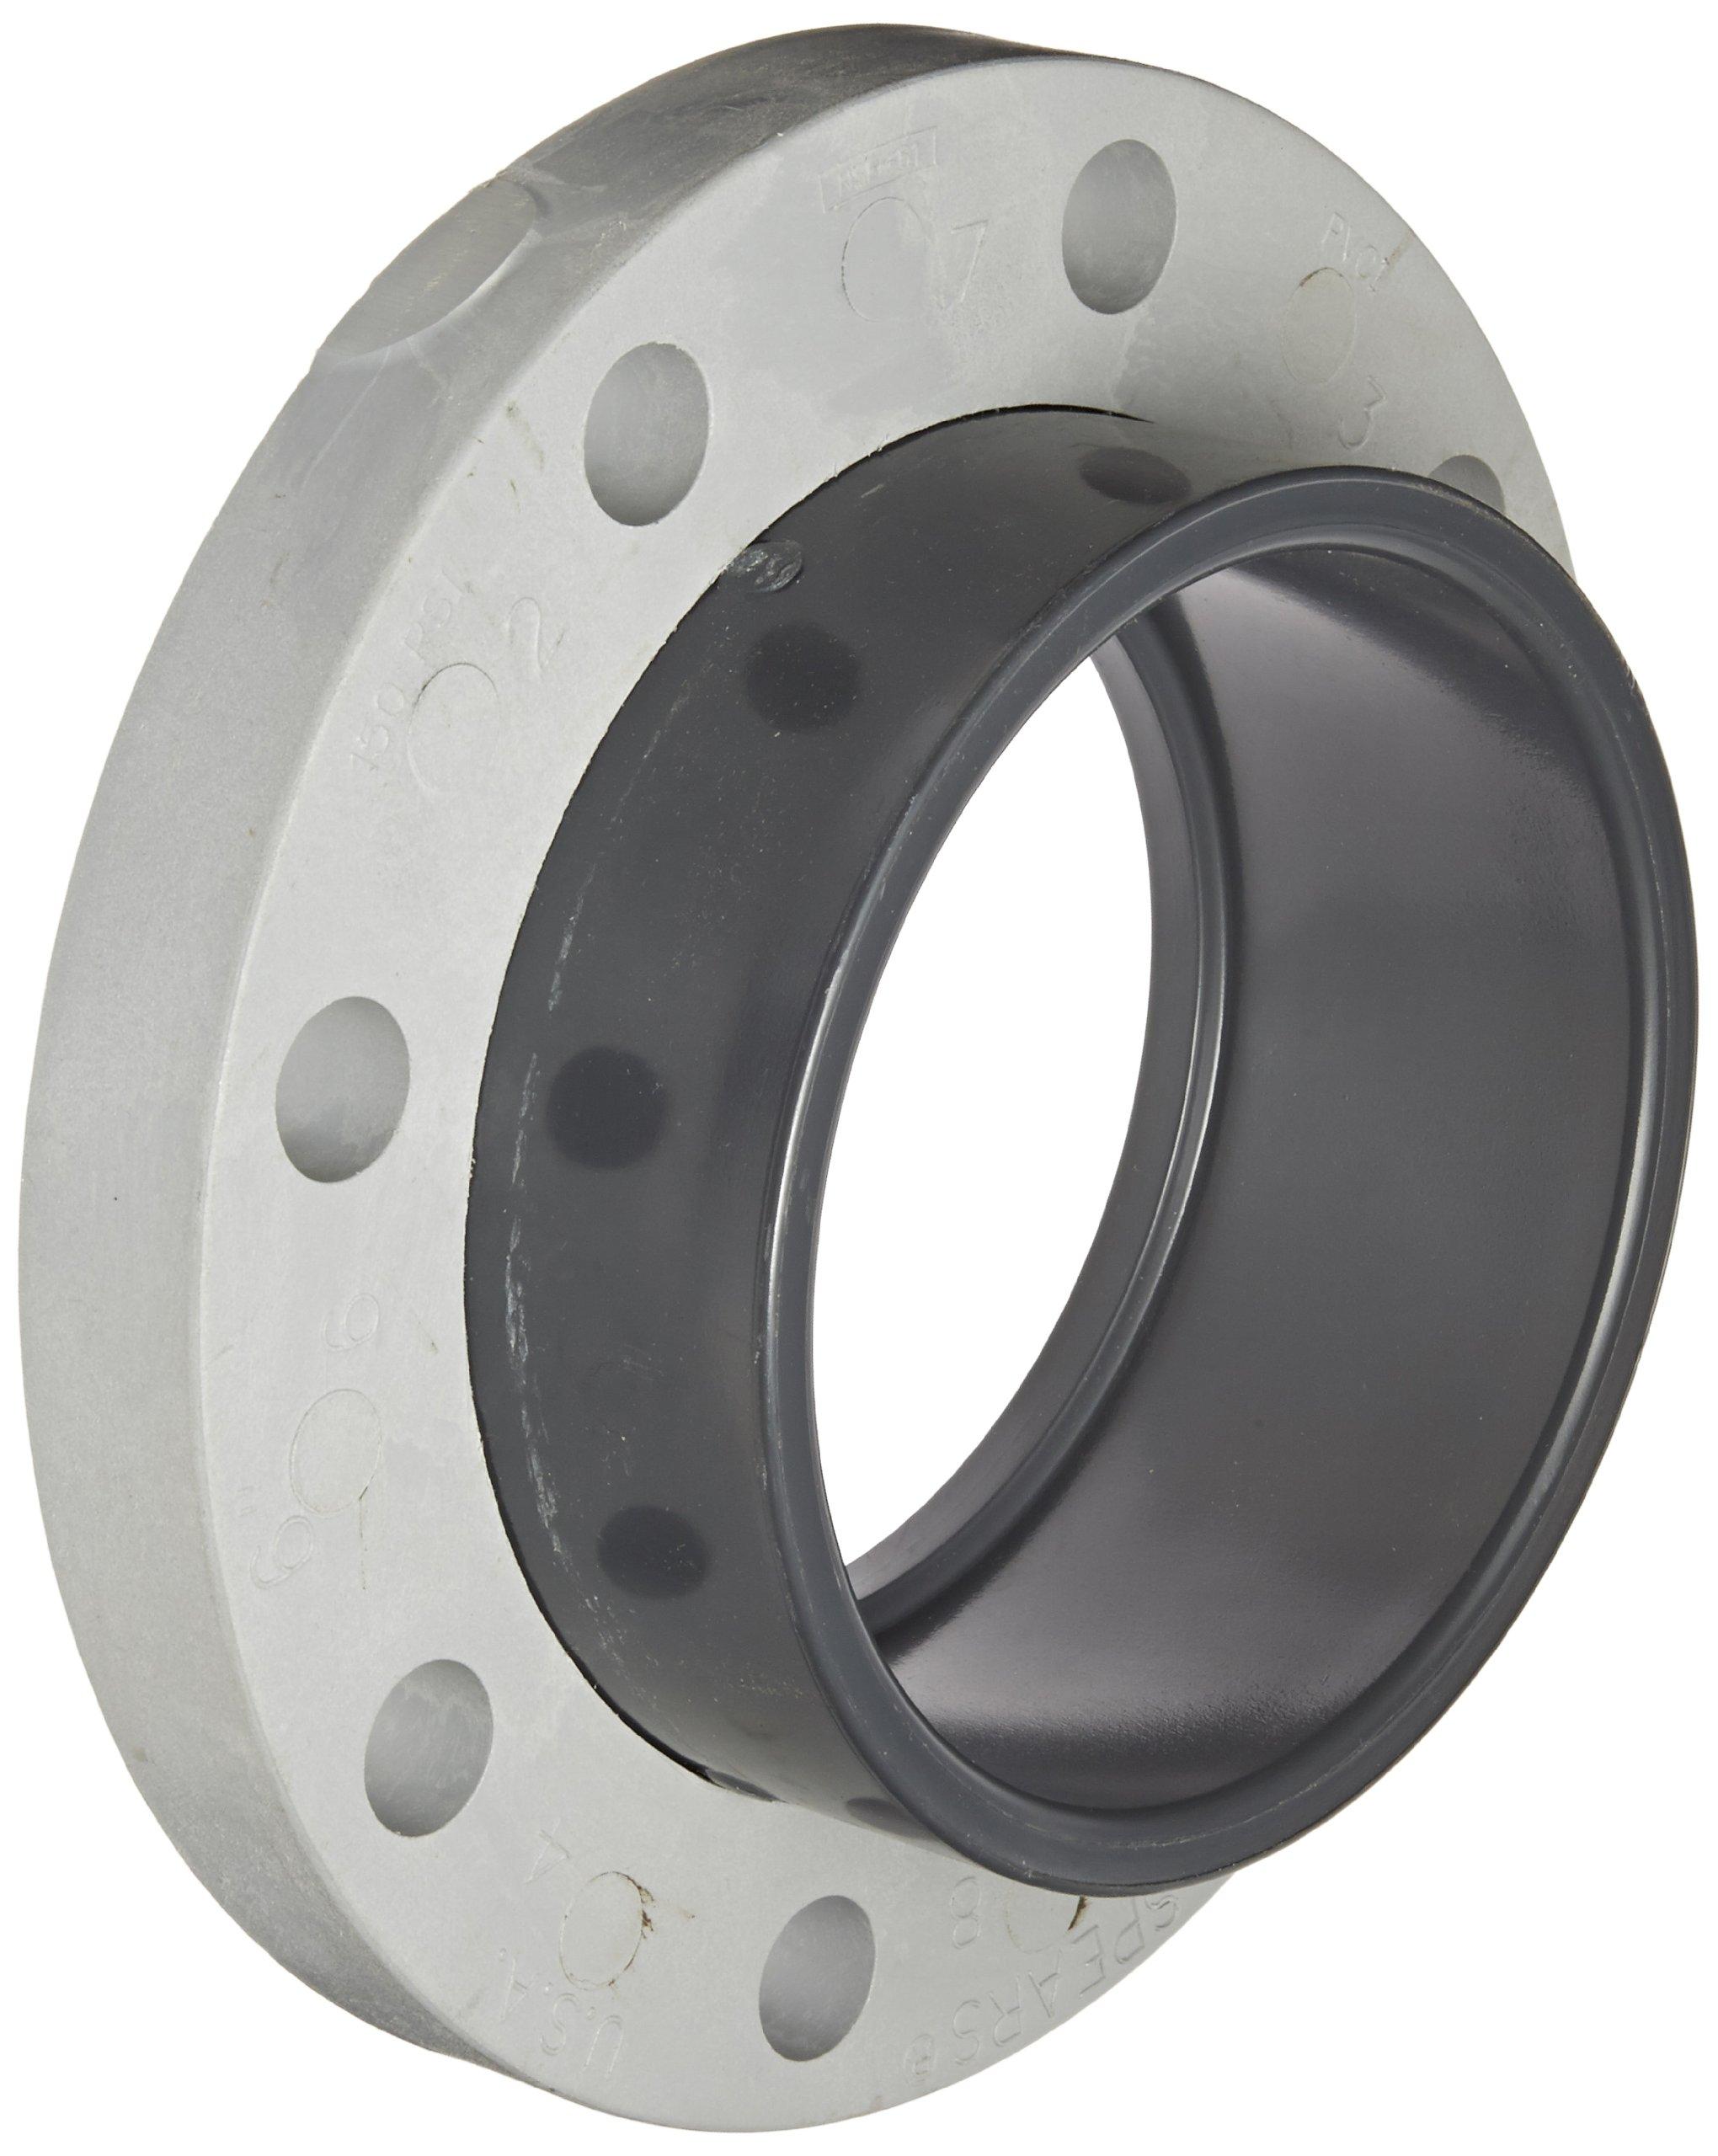 ss flange foot pin inch high pinterest valve floor